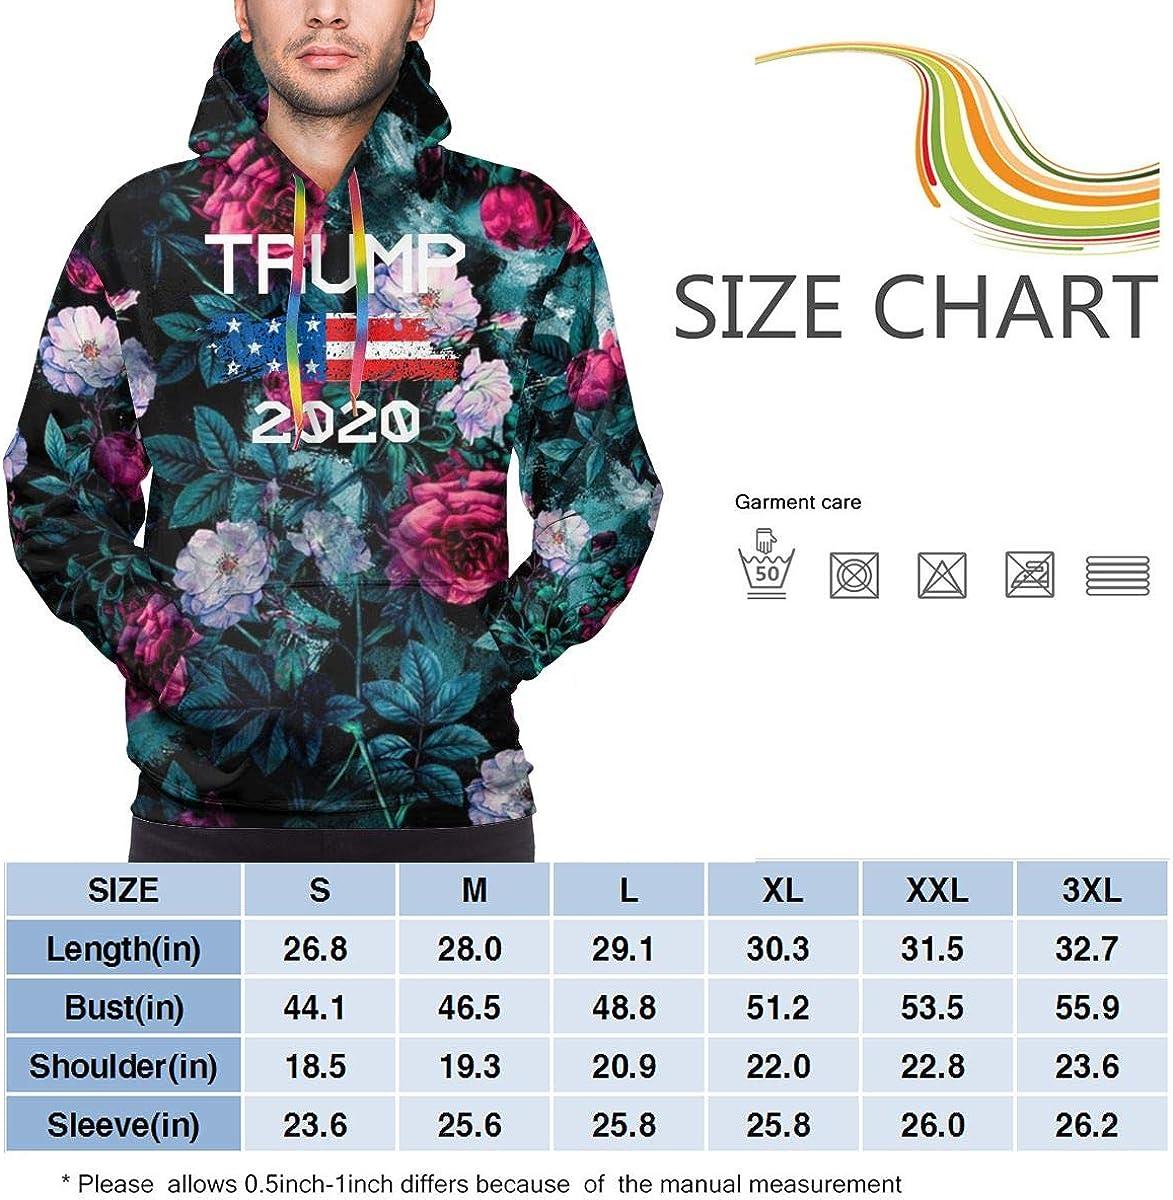 MUSICOT Mens Athletic Pullover Cozy Sport Outwear Trump 2020 Come Sweatshirt Hoodies